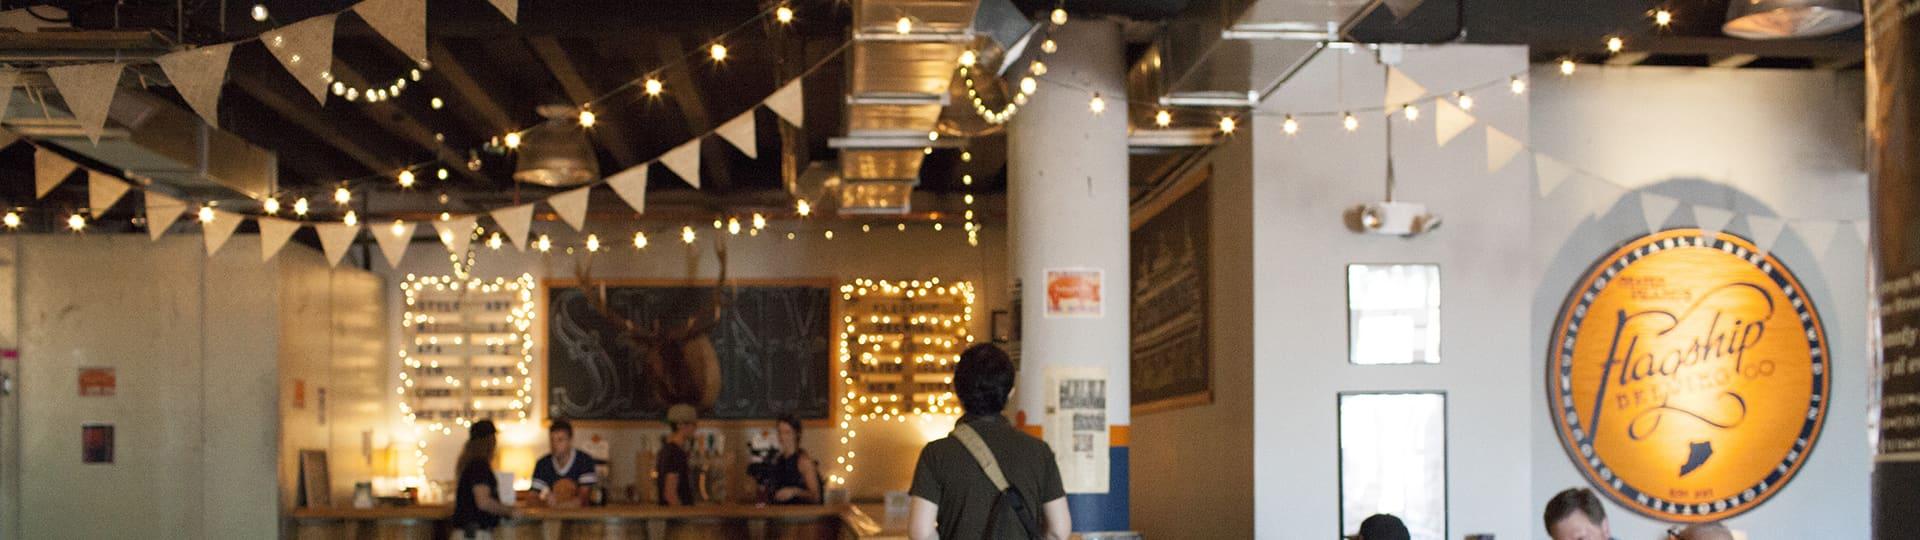 St George, Flagship Brewery, Staten Island,